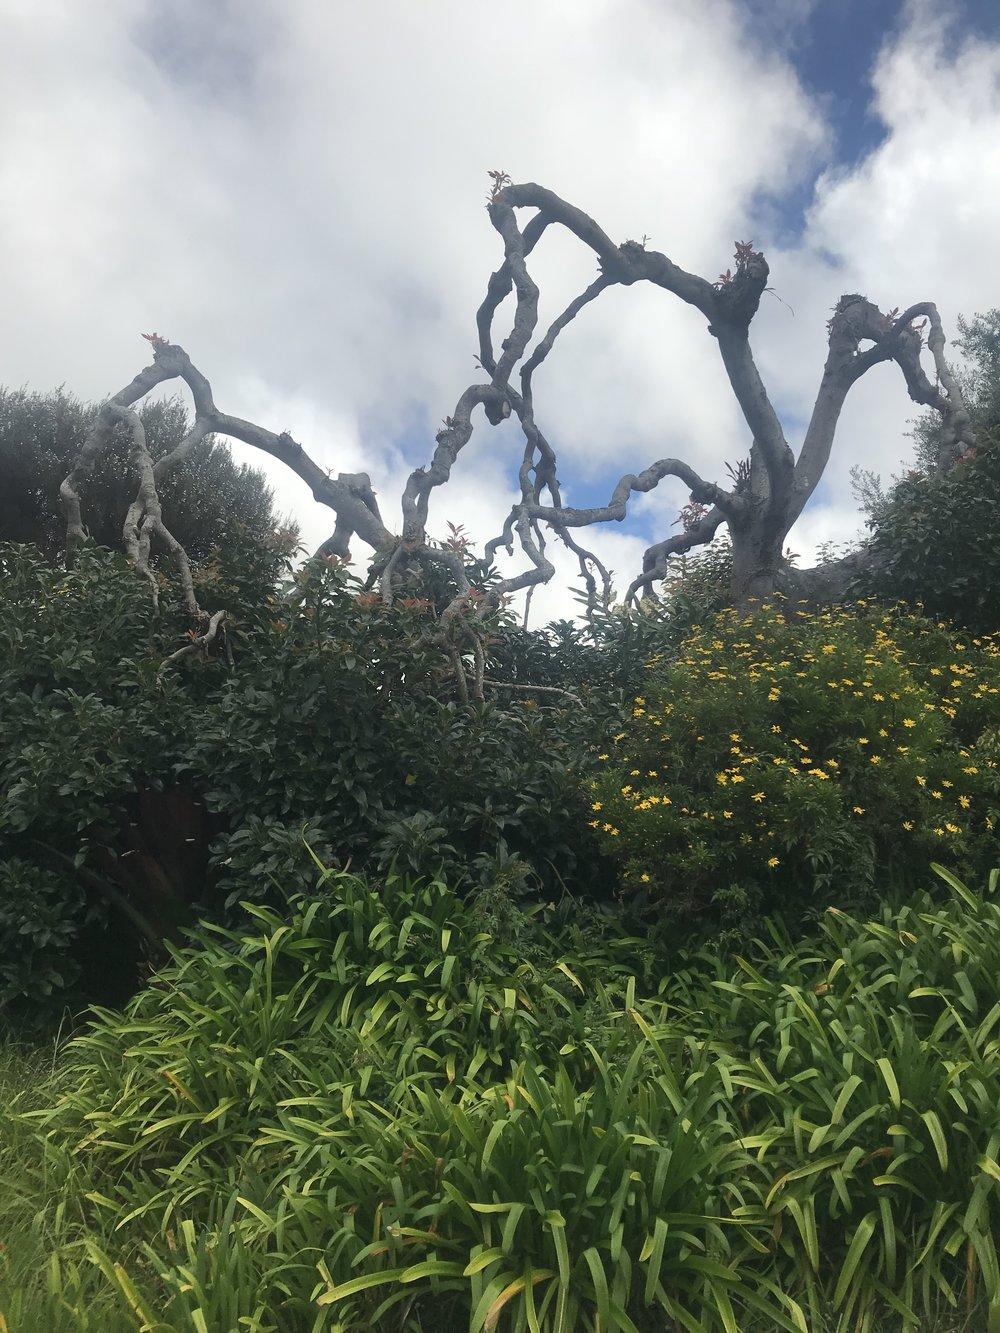 A bonsai avocado tree